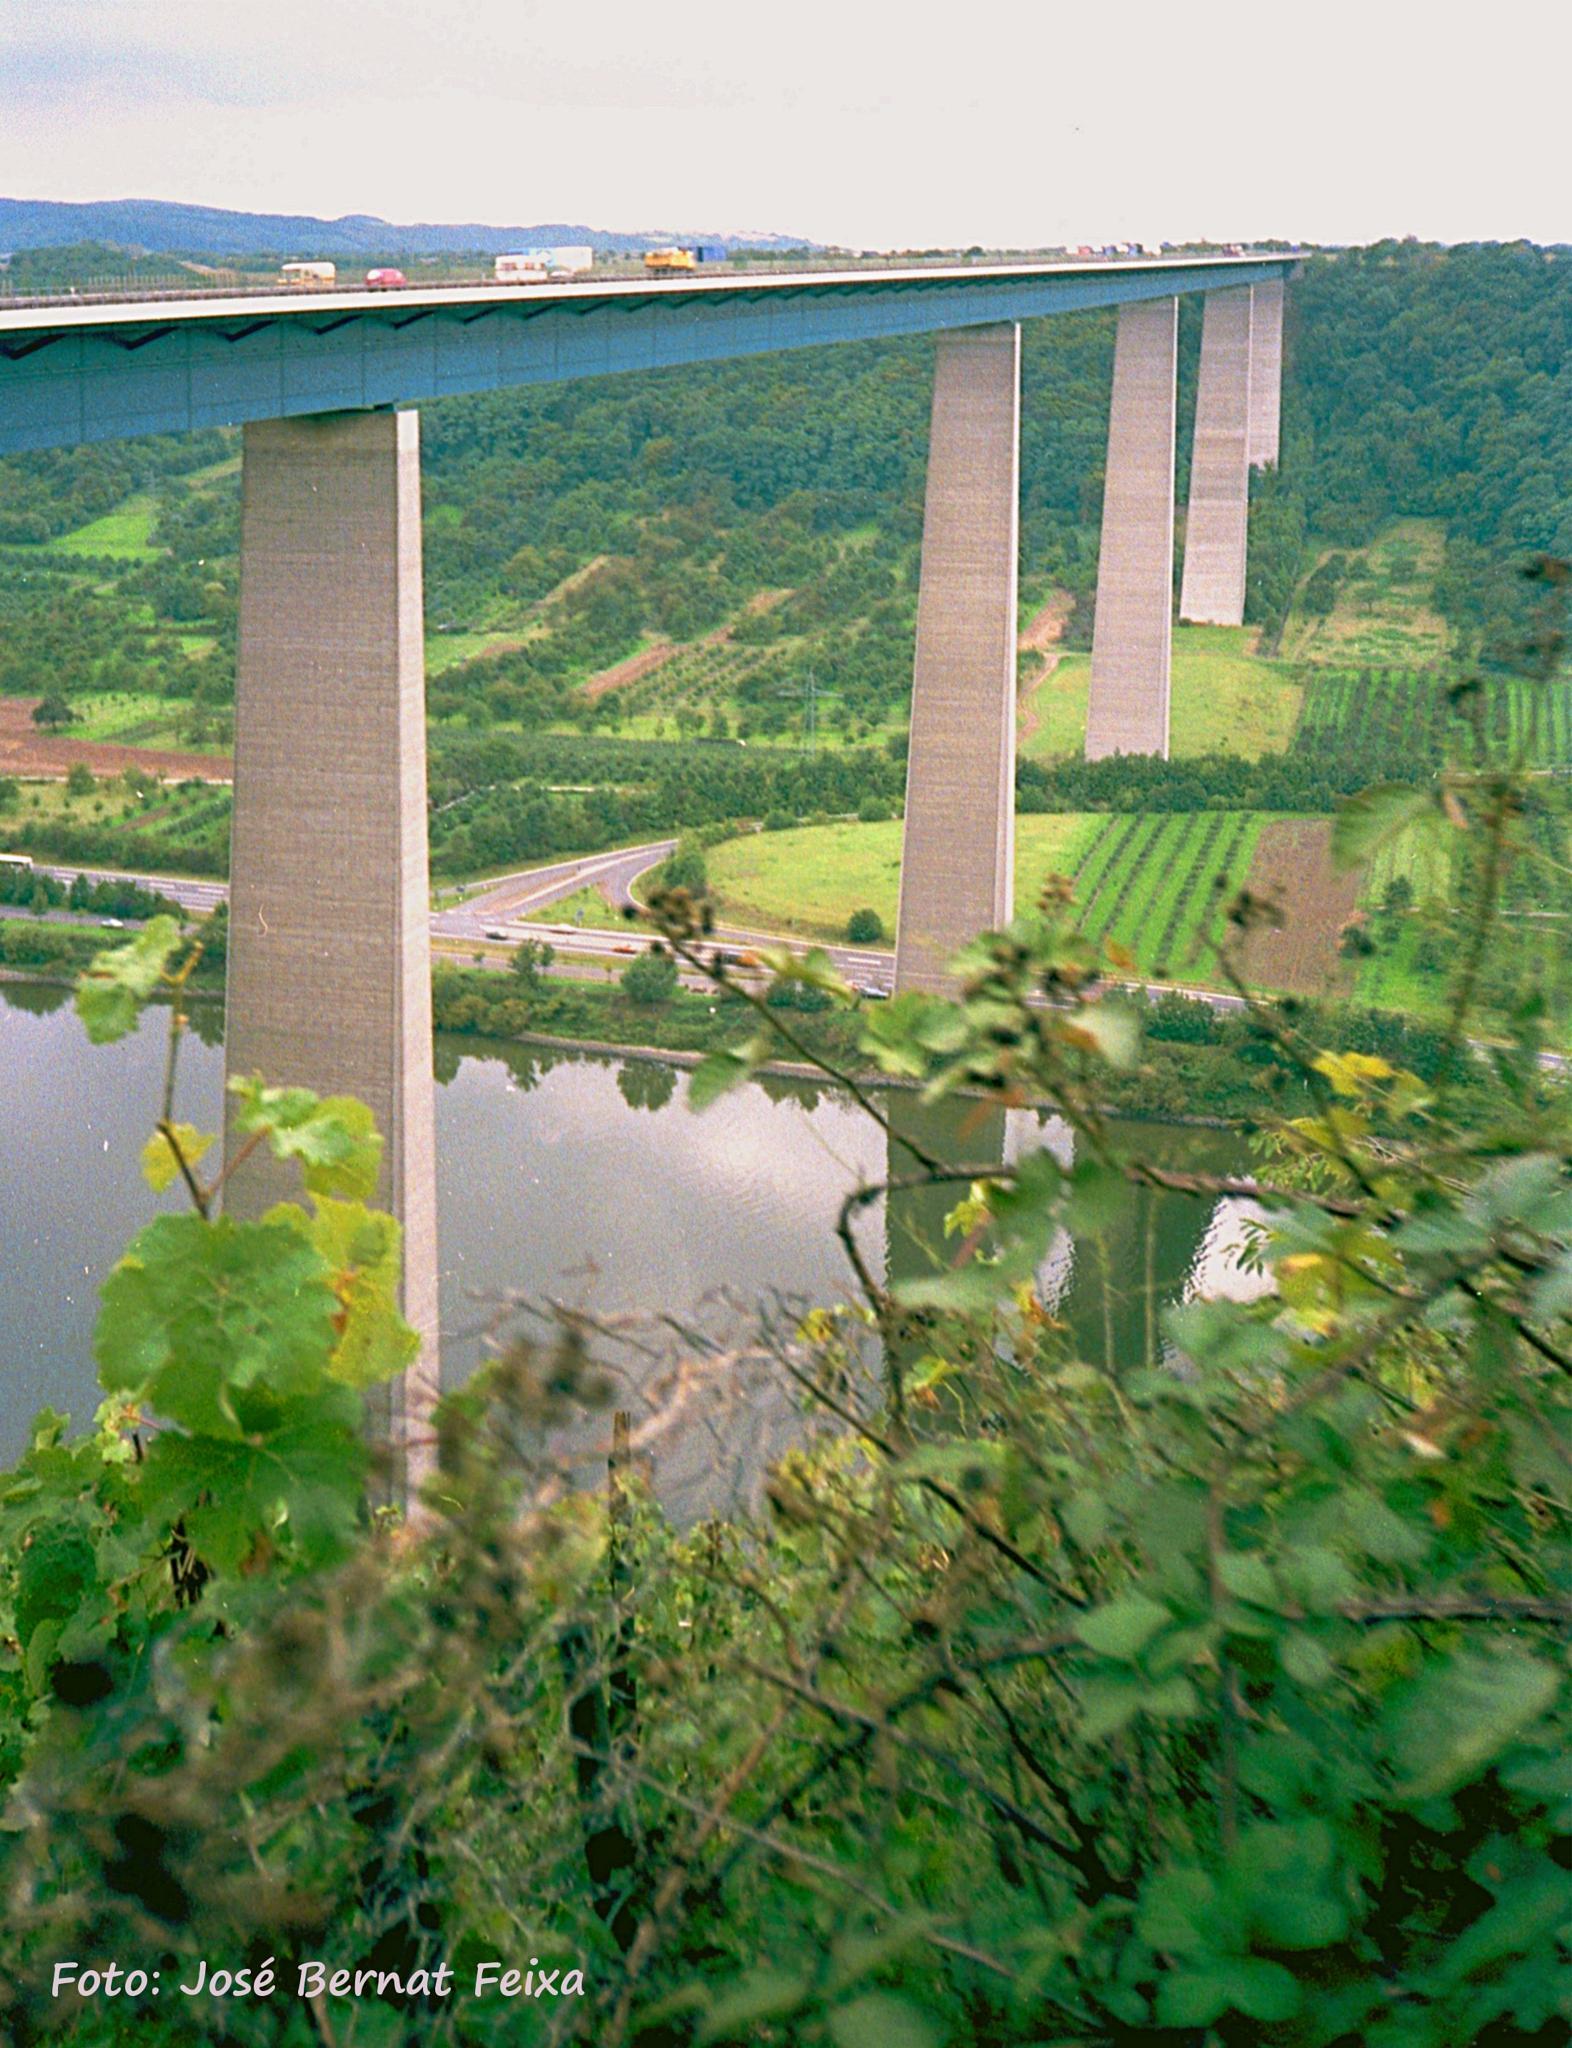 PUENTE, BRUG, BRIDGE,  by José Bernat Feixa